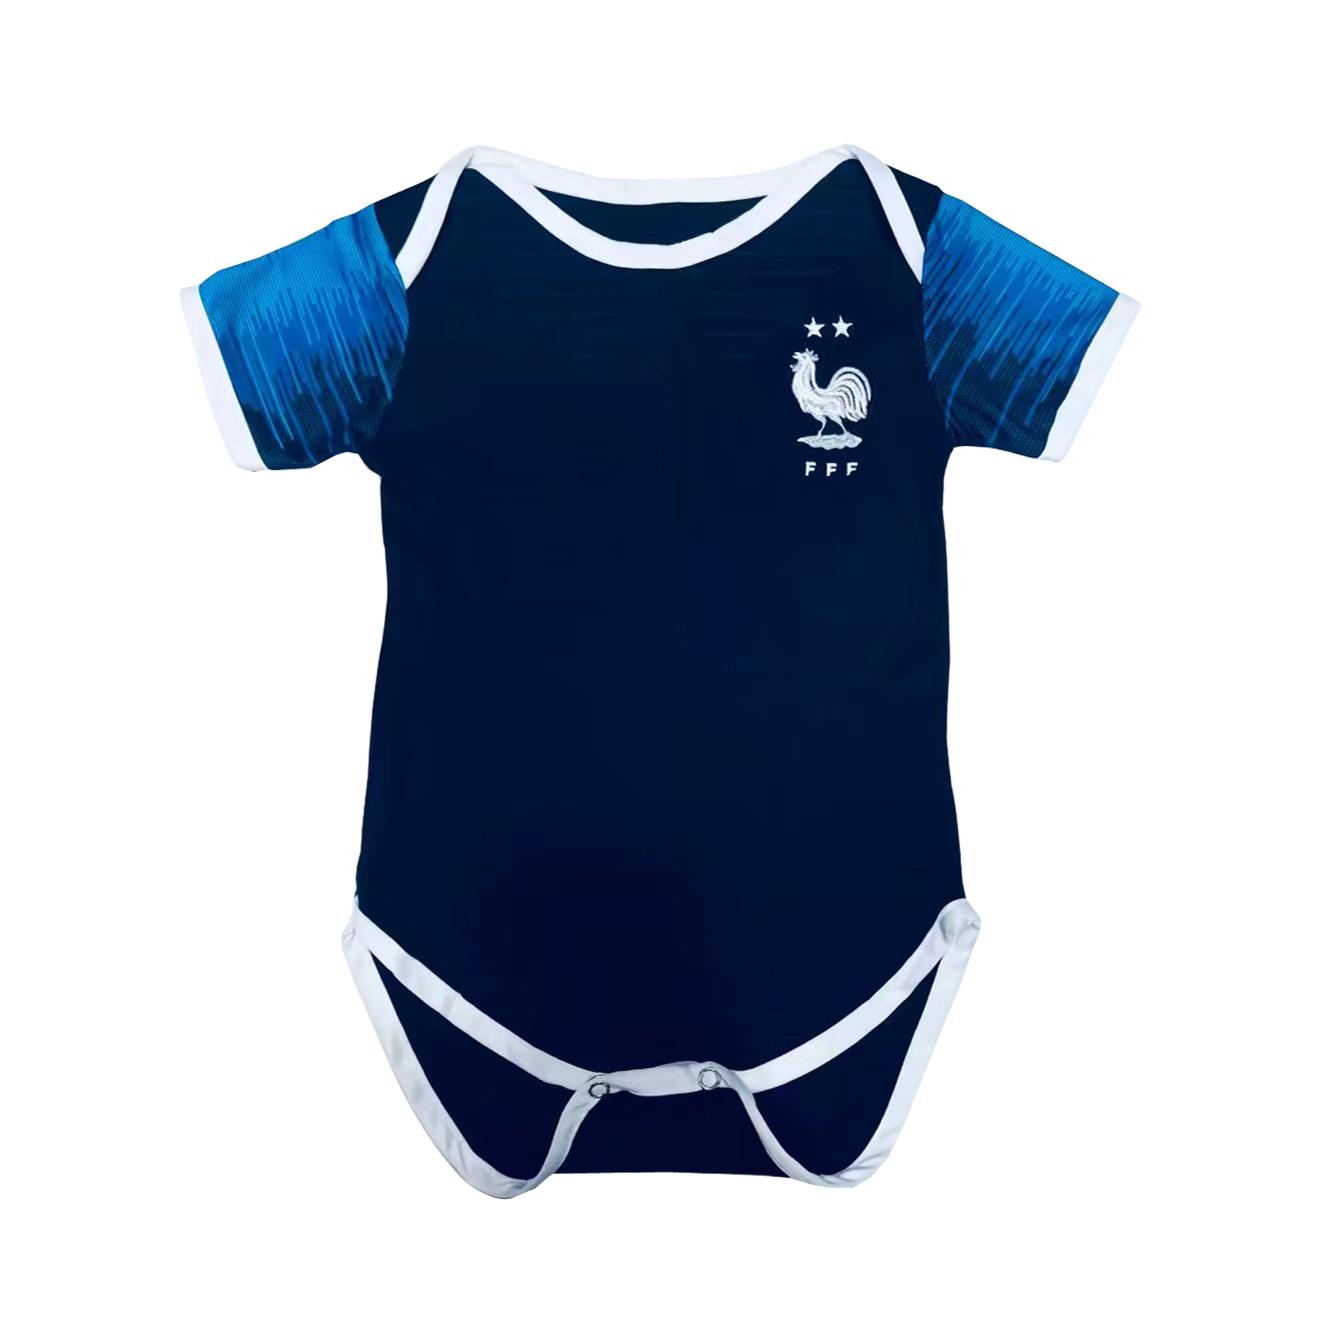 6950ad9dba3 France 2018 World Cup Home 2-Star Infant Soccer Jerseys Shirt Little Kids